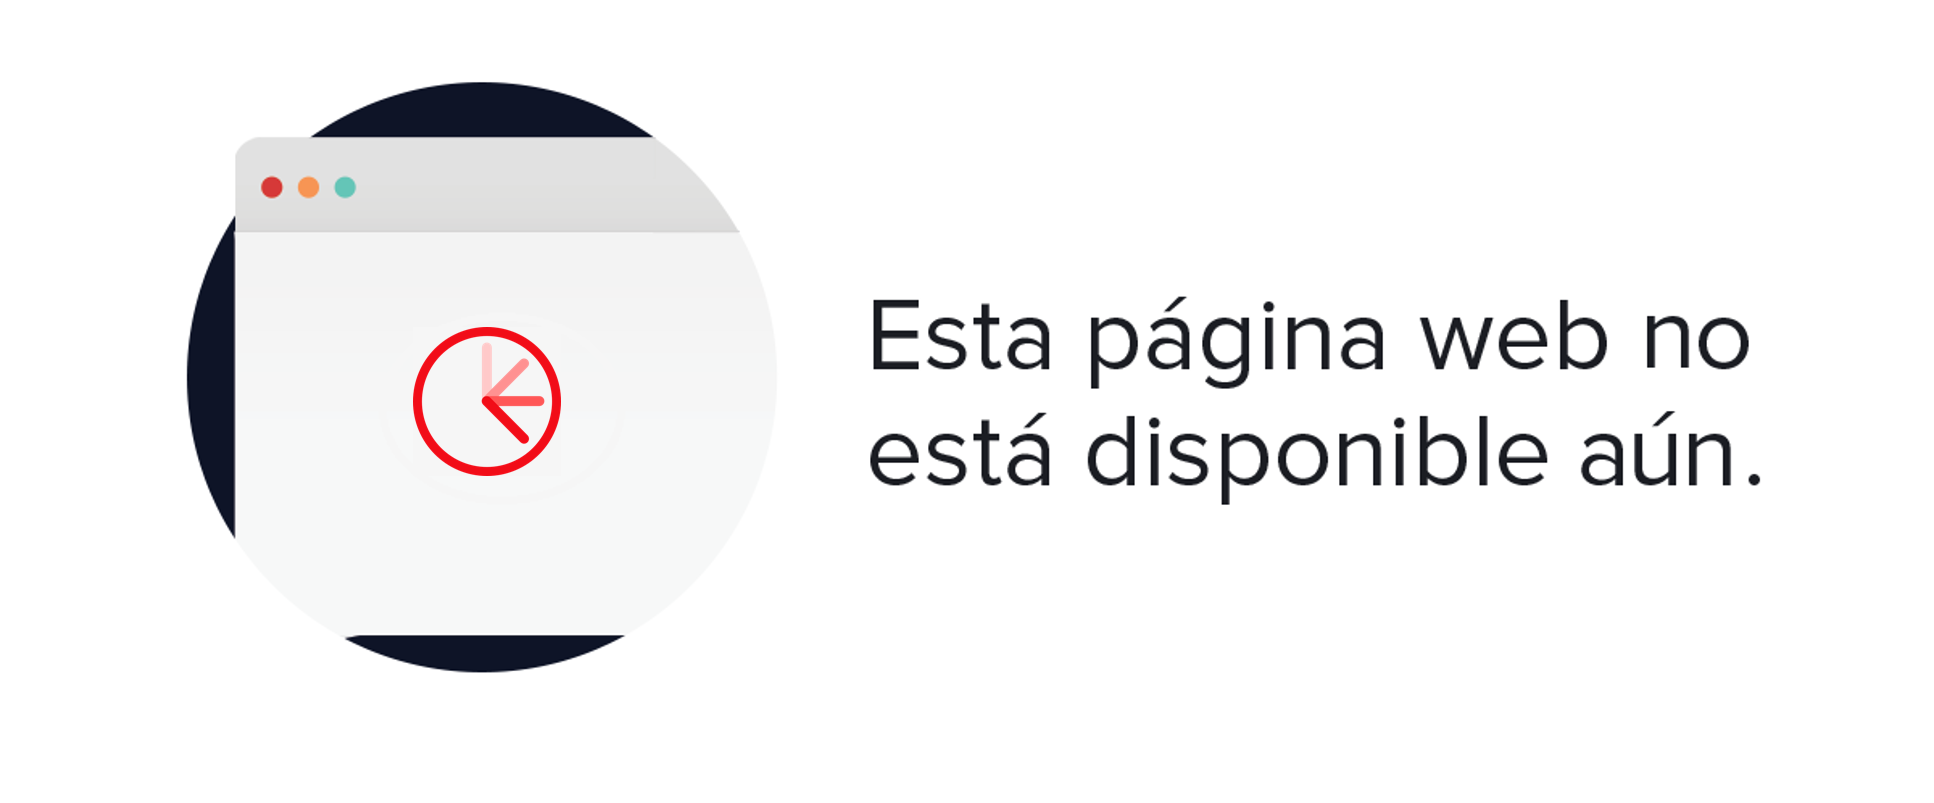 OXXO - Chaqueta de mujer OXXO tipo camisa de corte amplio Blanco 8681613048256 - NXCPPCJ